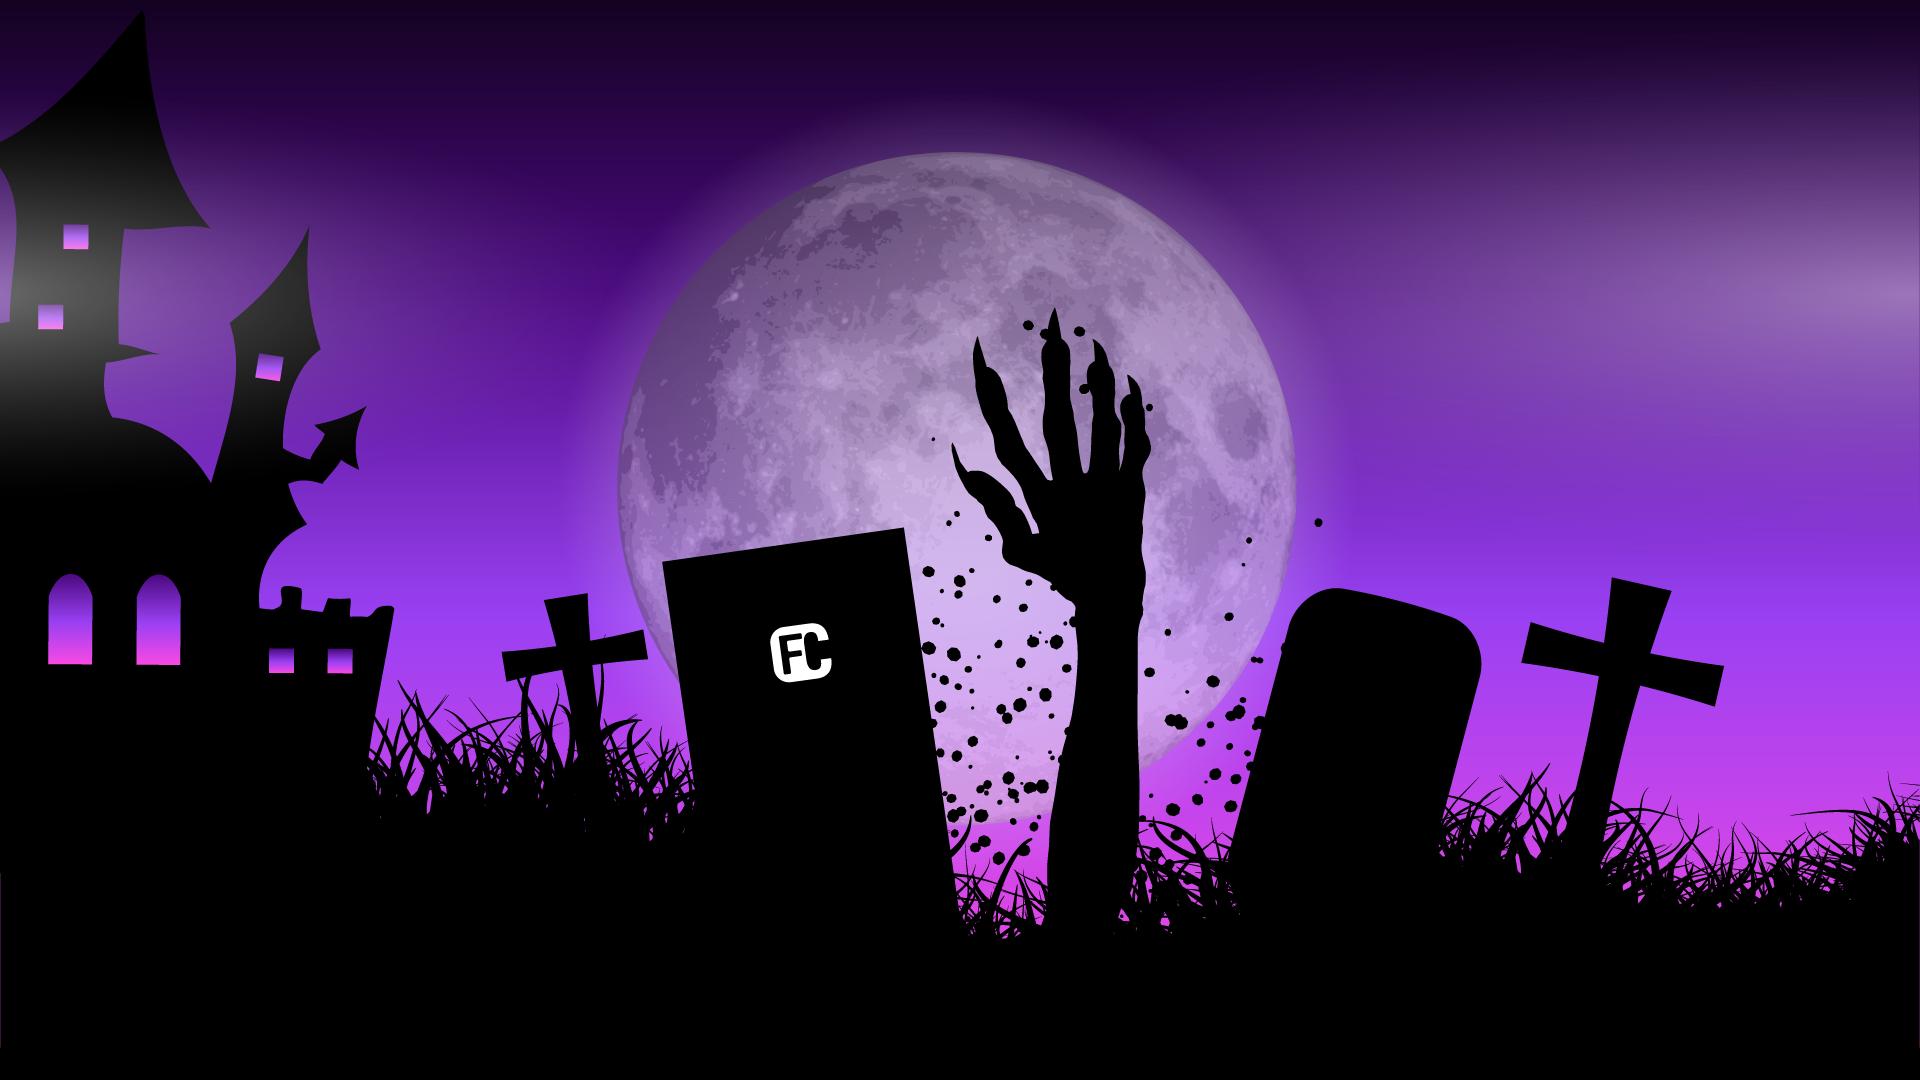 Zombie-Hand-In-Halloween-Landscape-Fllcasts